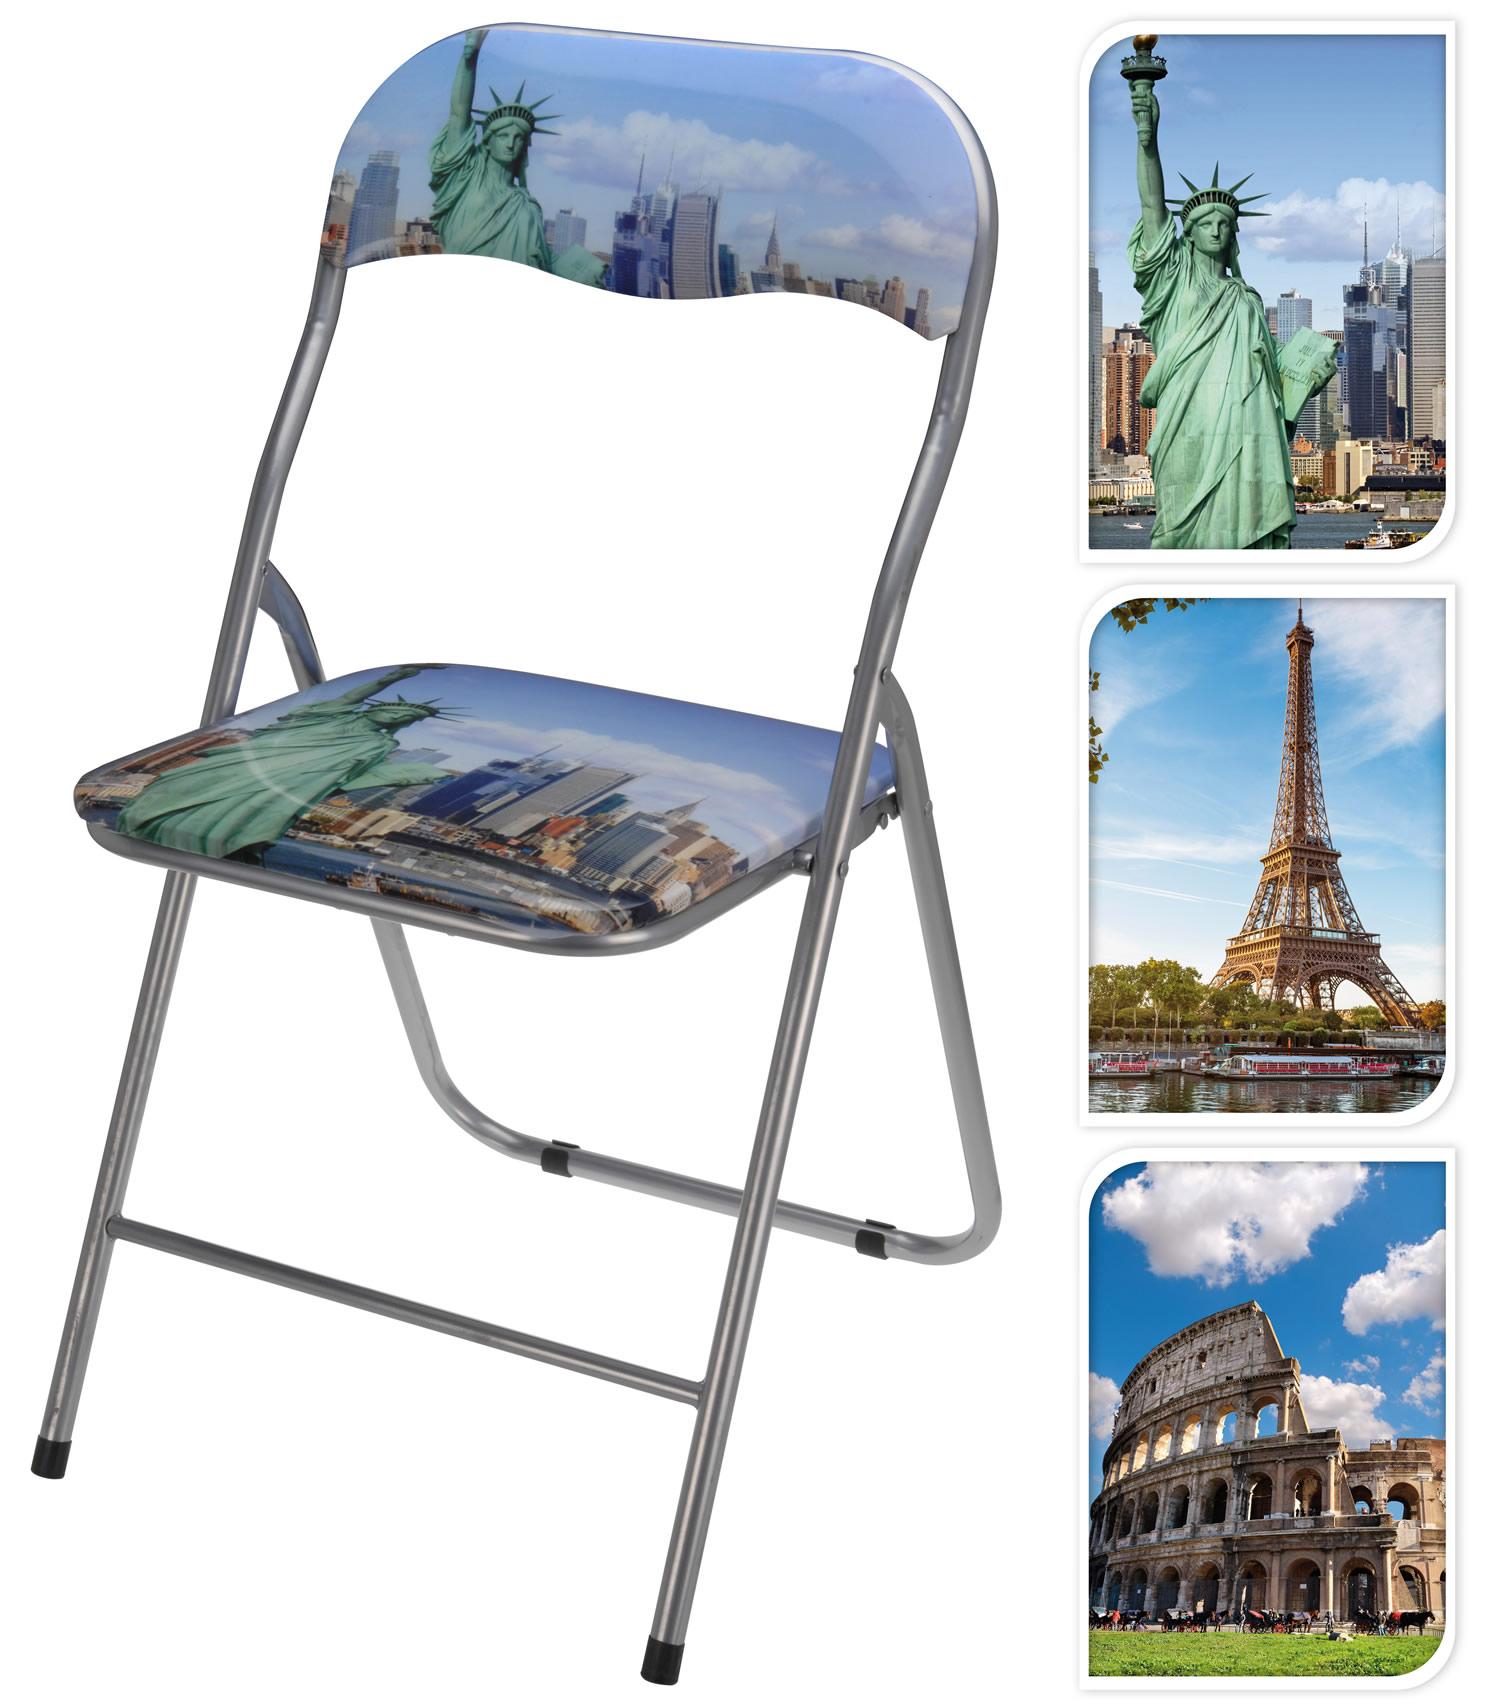 design klappstuhl besucherstuhl faltstuhl beistellstuhl regiestuhl metall motiv ebay. Black Bedroom Furniture Sets. Home Design Ideas